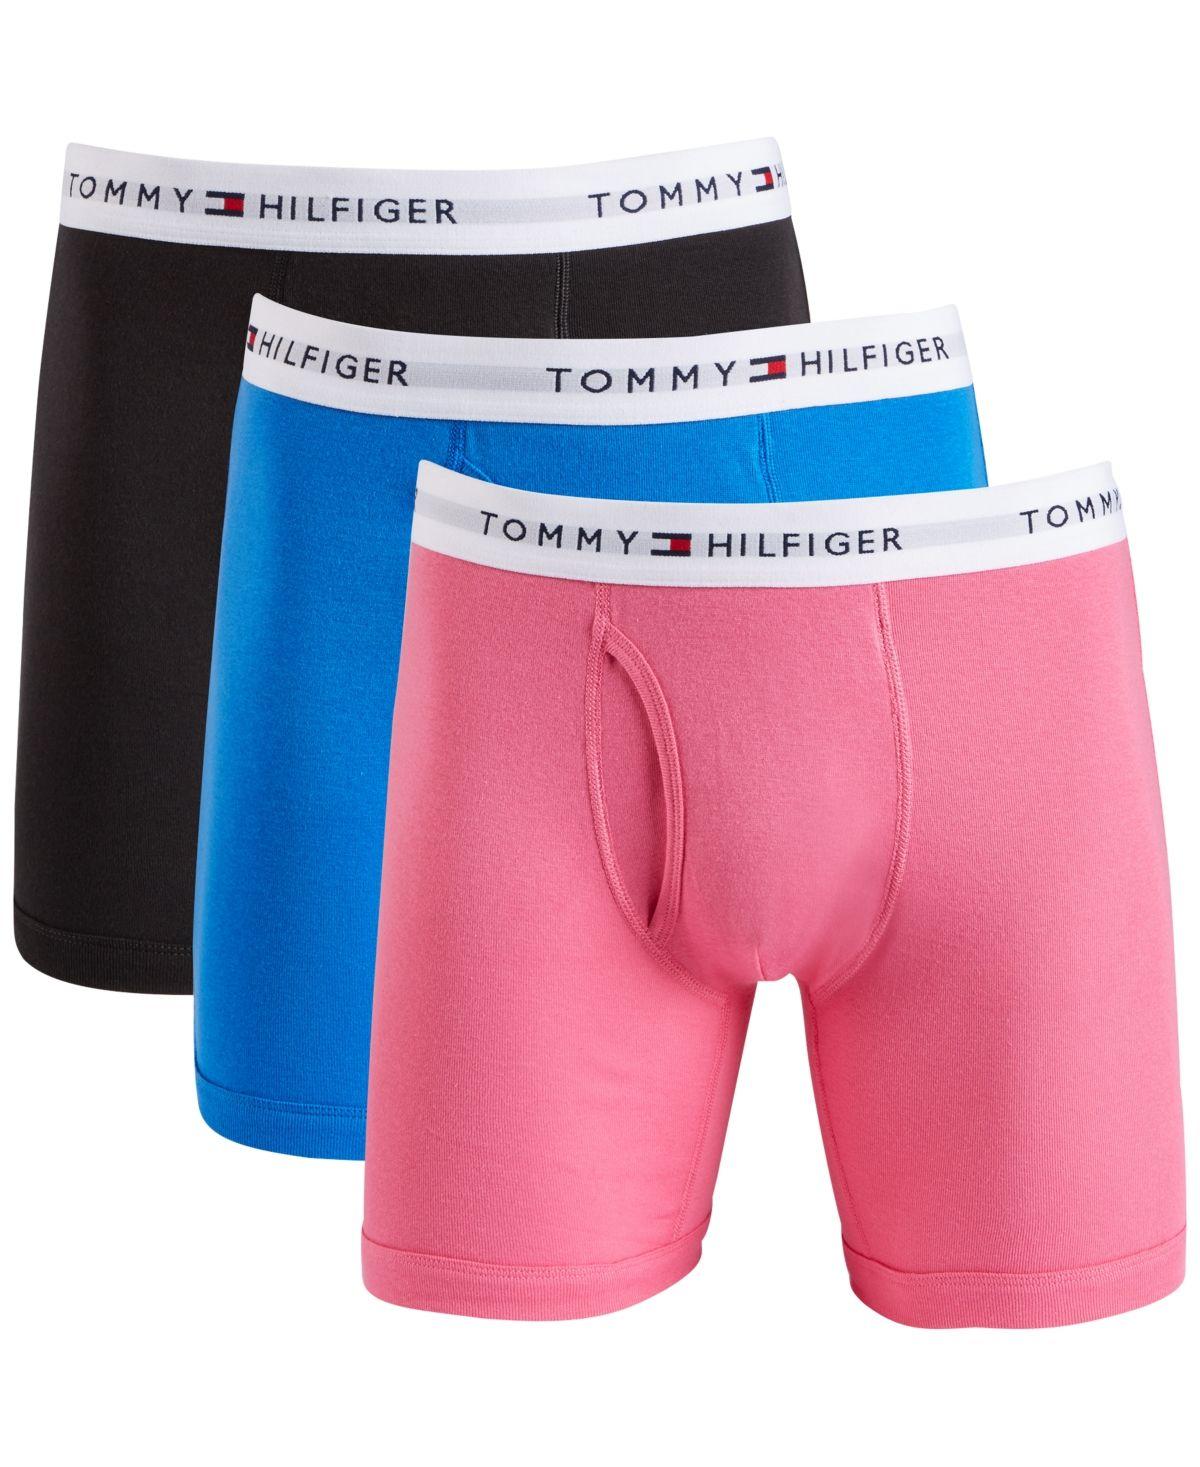 Tommy Hilfiger Men's Cotton Boxer Brief 3Pack Bright